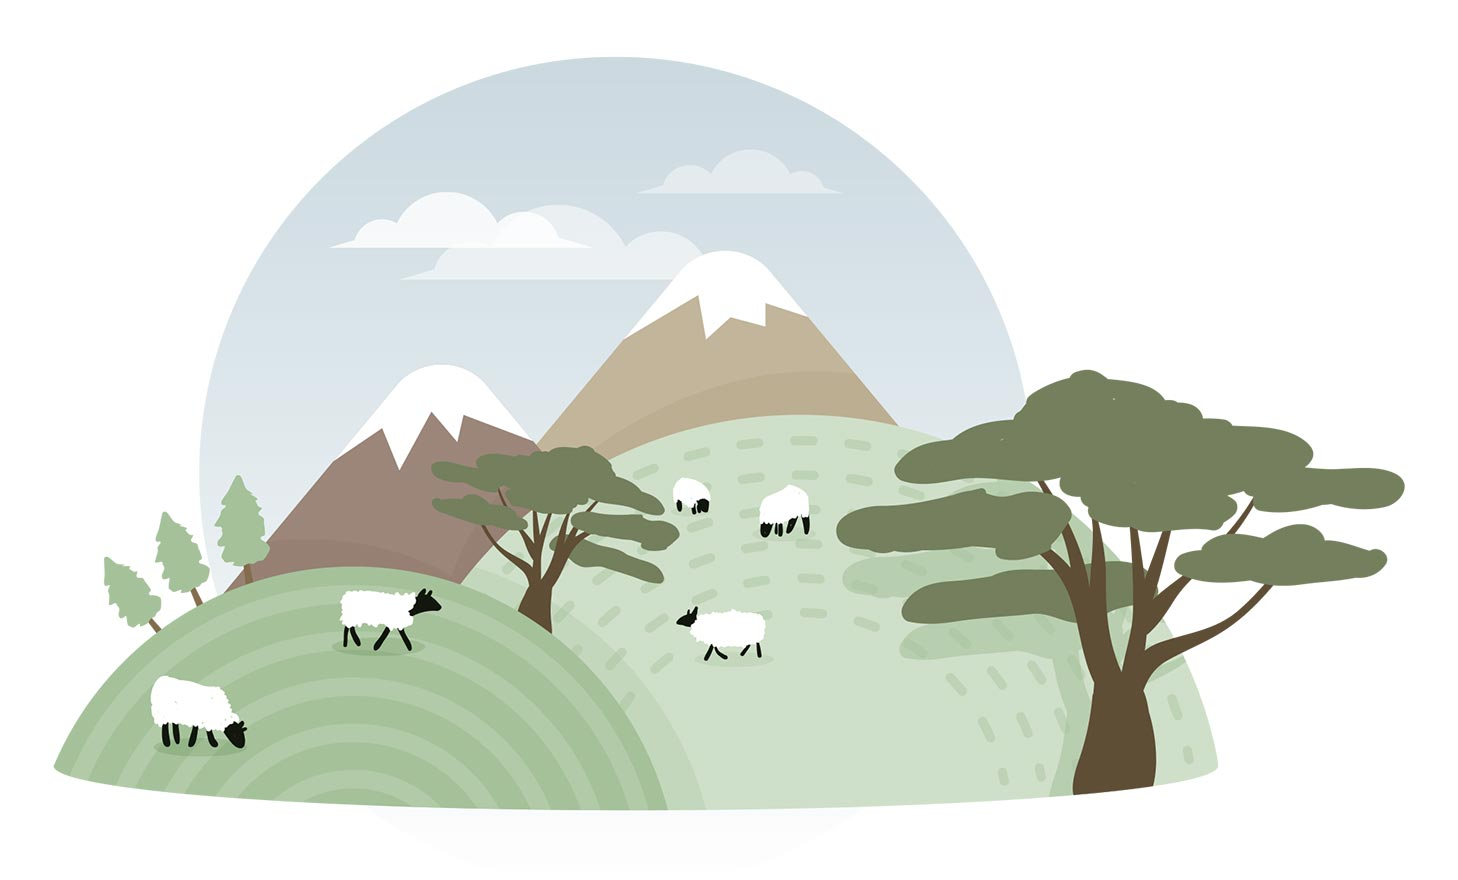 Sheep among hills and mountains grazing.